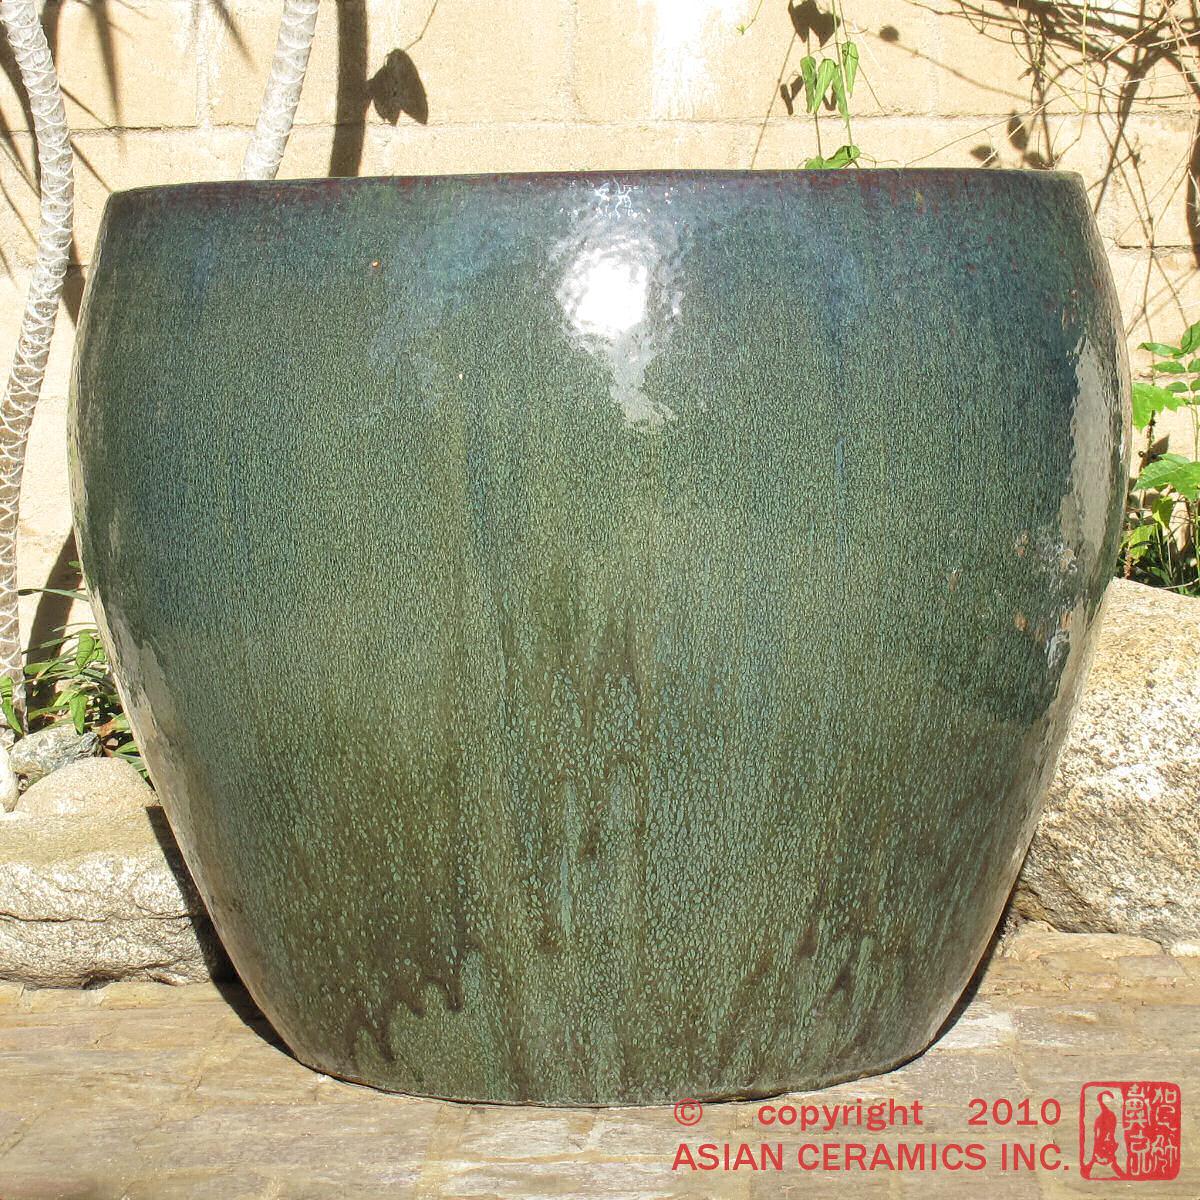 for plant art large flower pots plants your green pin pot planter ceramic